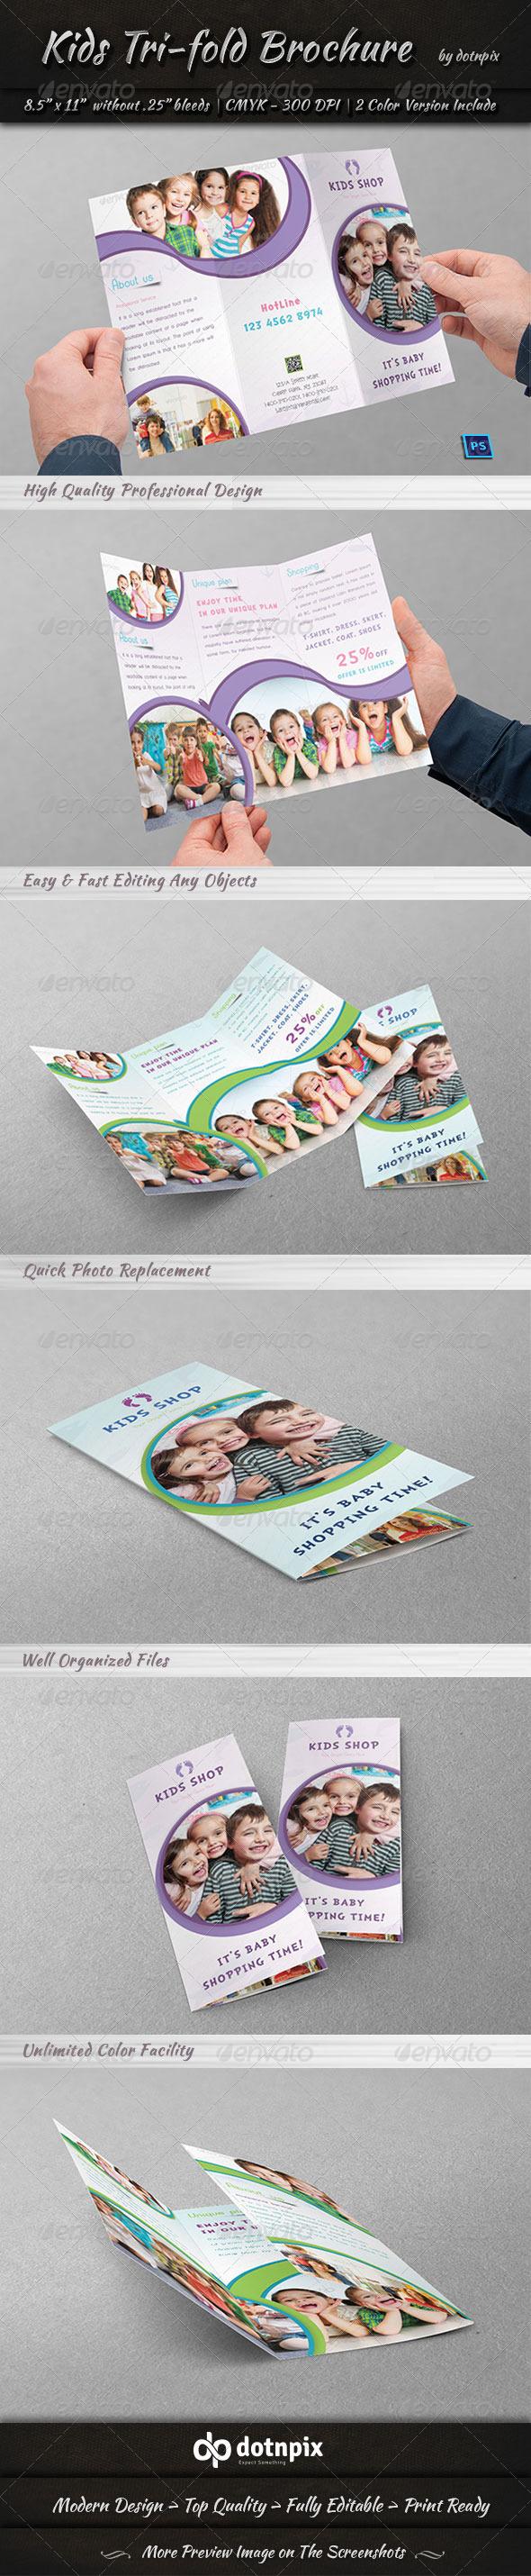 GraphicRiver Kids Tri-Fold Brochure 7512304